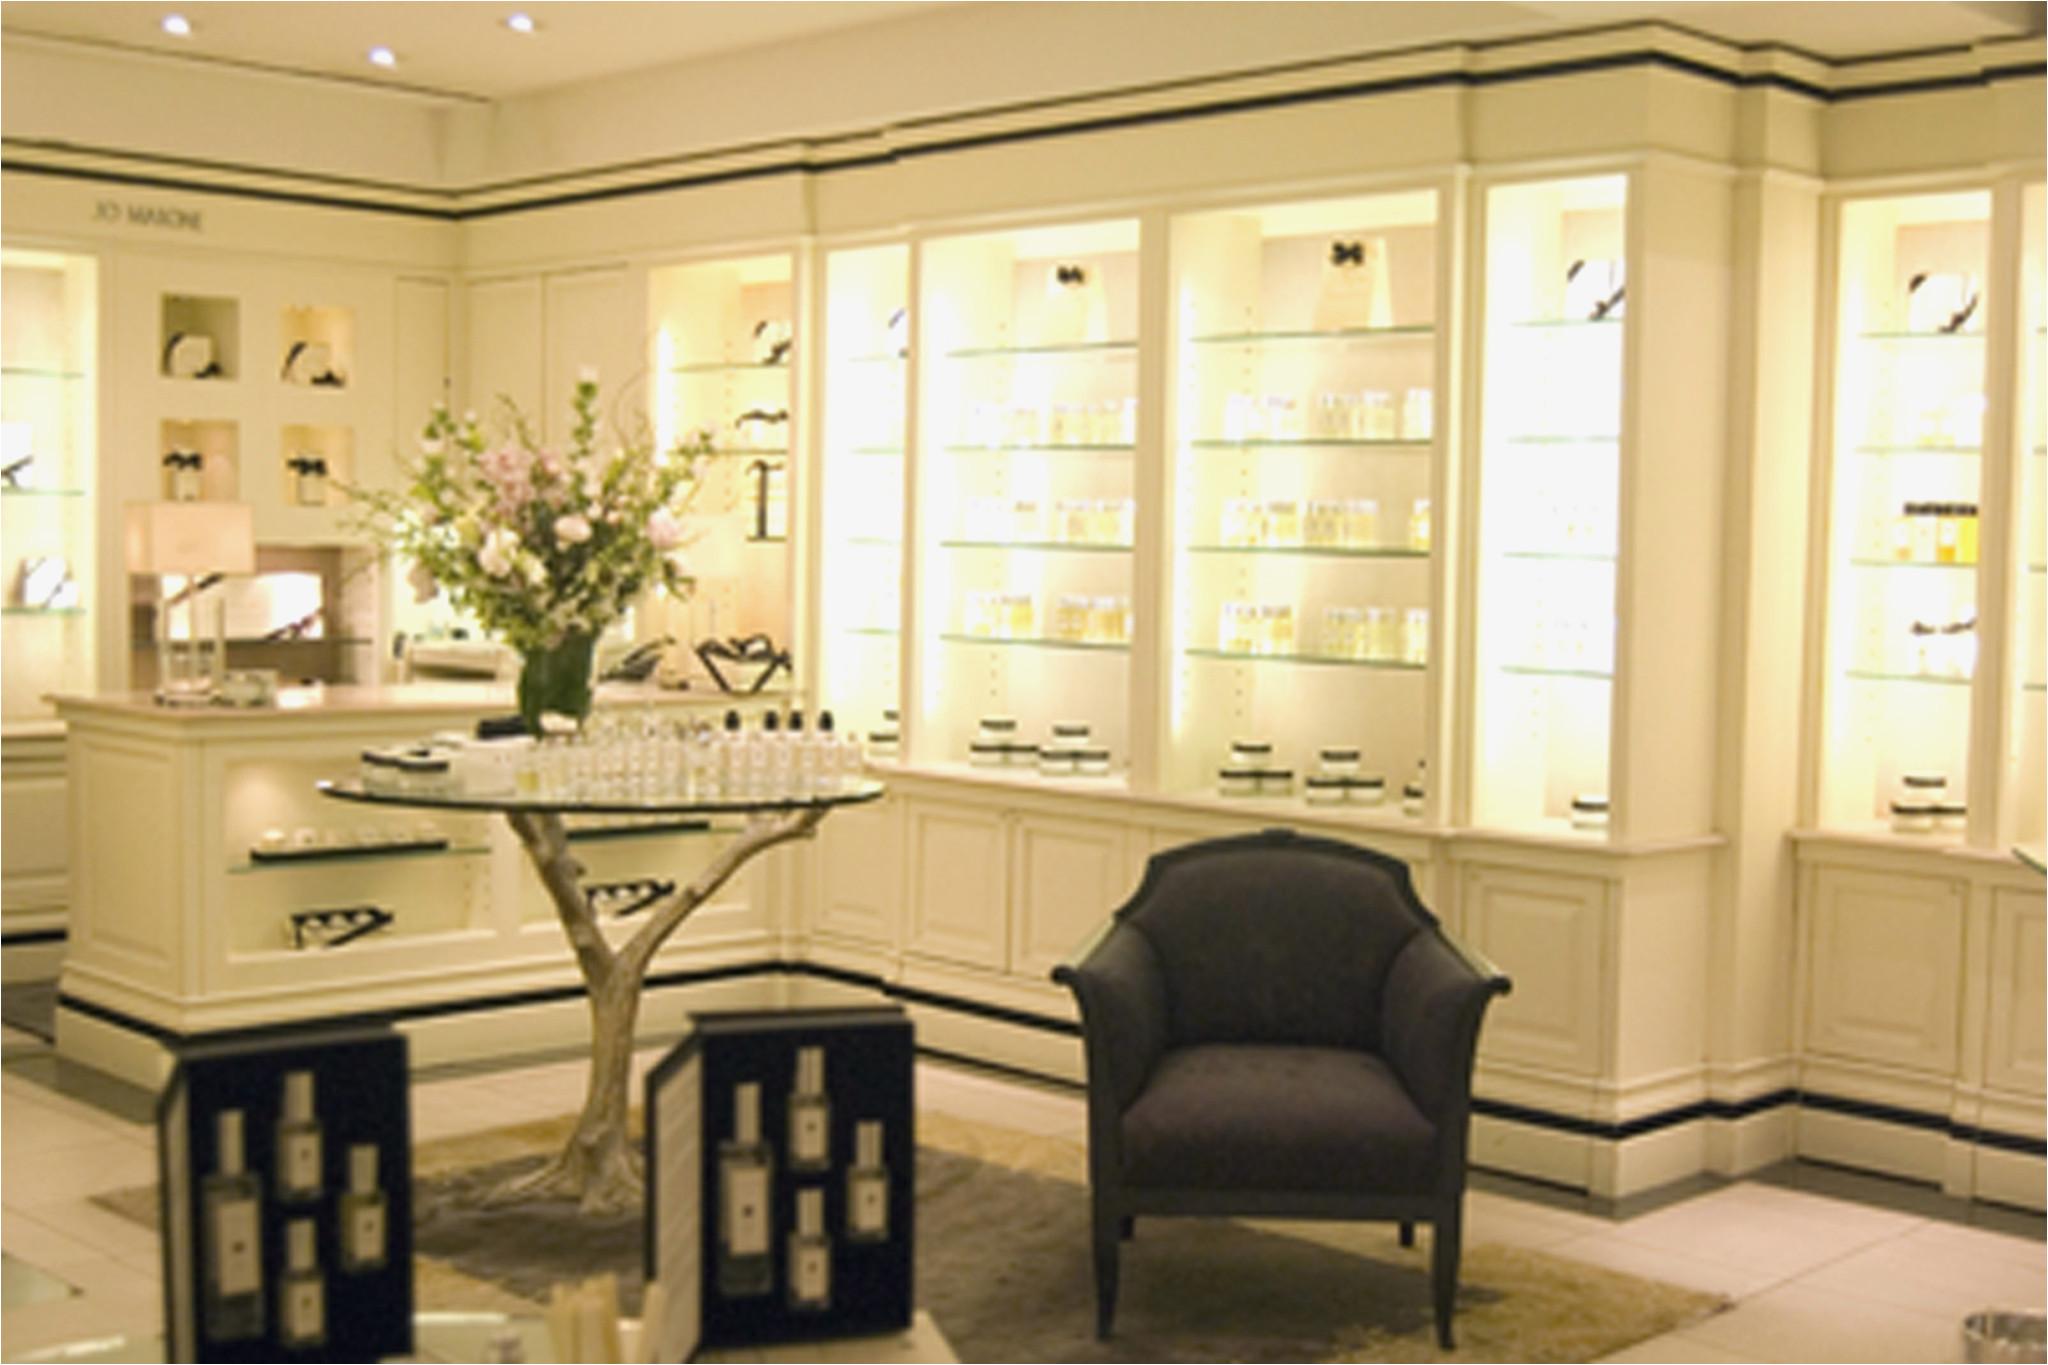 furniture best craigslist mcallen edinburg furniture decor idea stunning lovely at design a room best